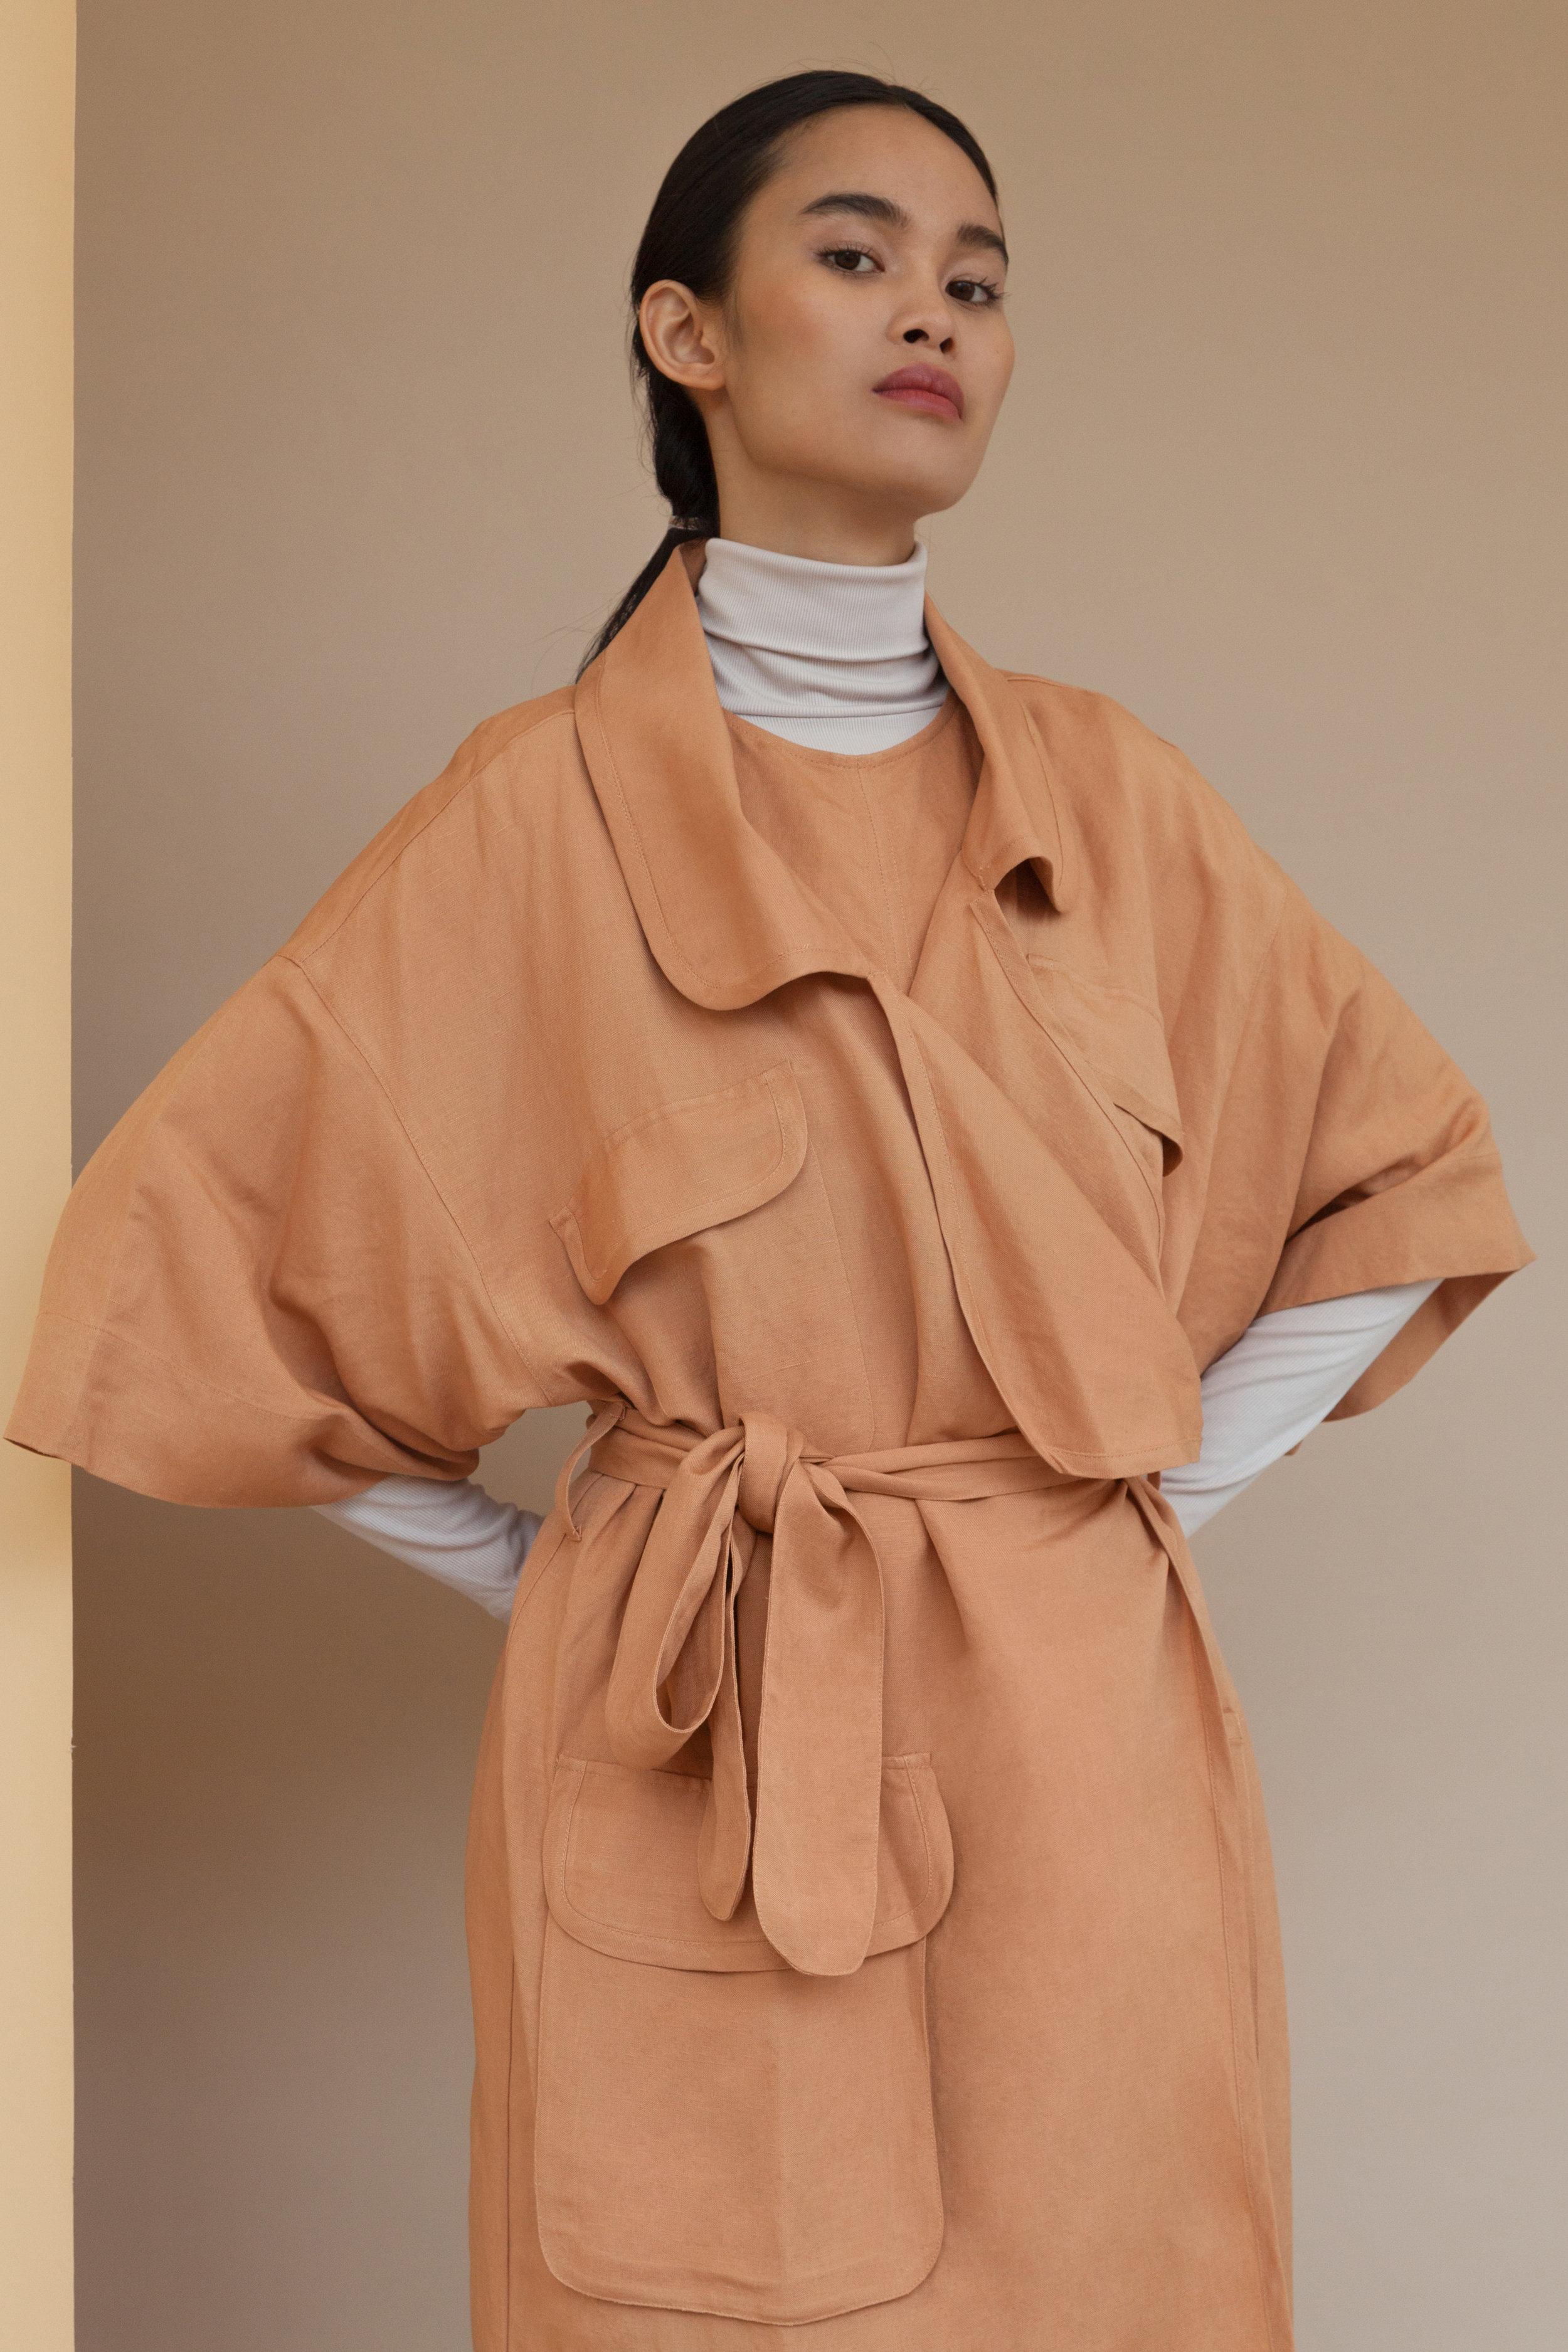 House-Dress-Carlisle-Coat-Garmentory-Linen-Trench